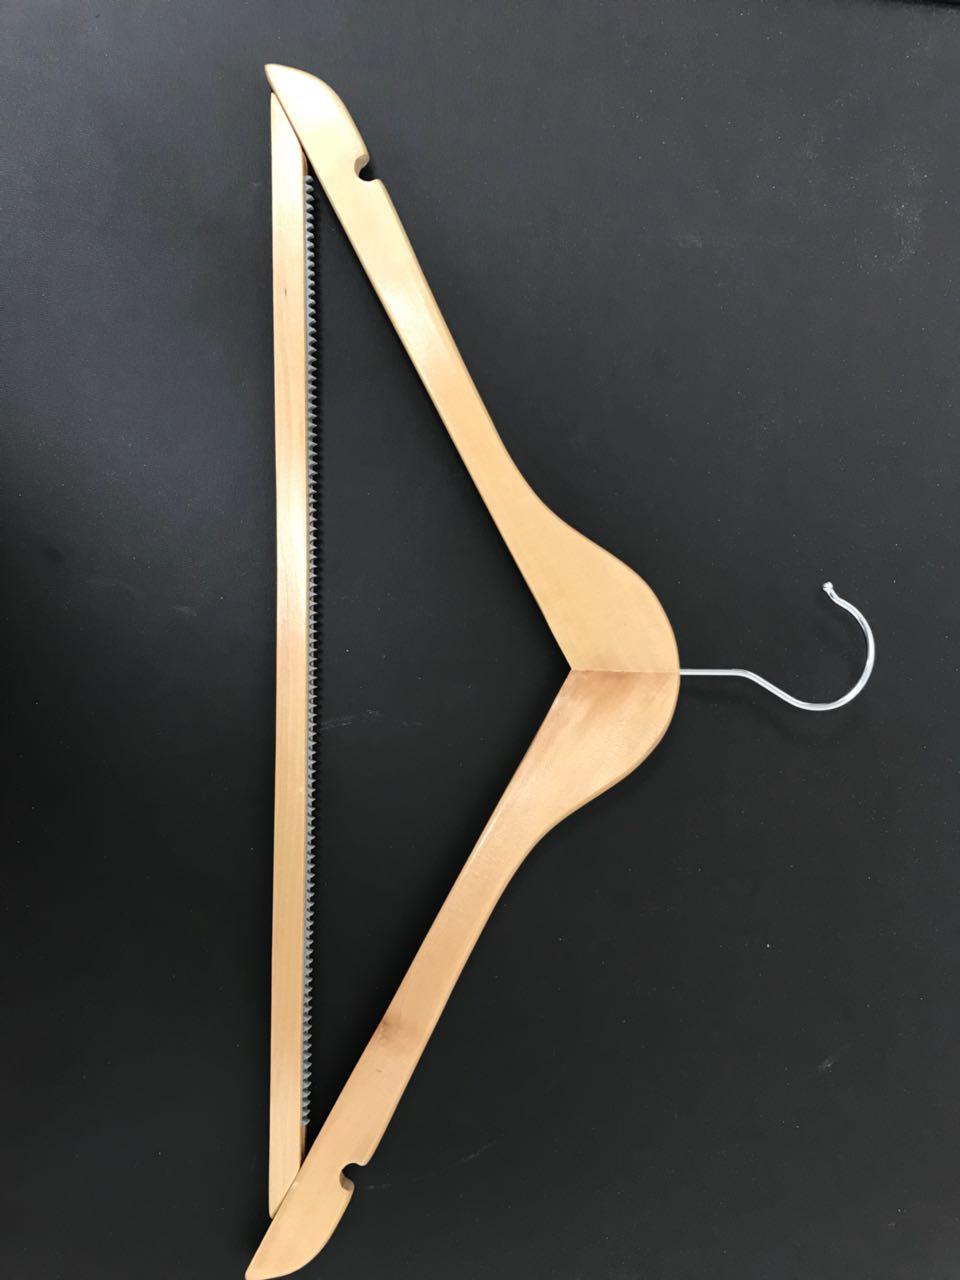 Looking to buy Cloth Hangers